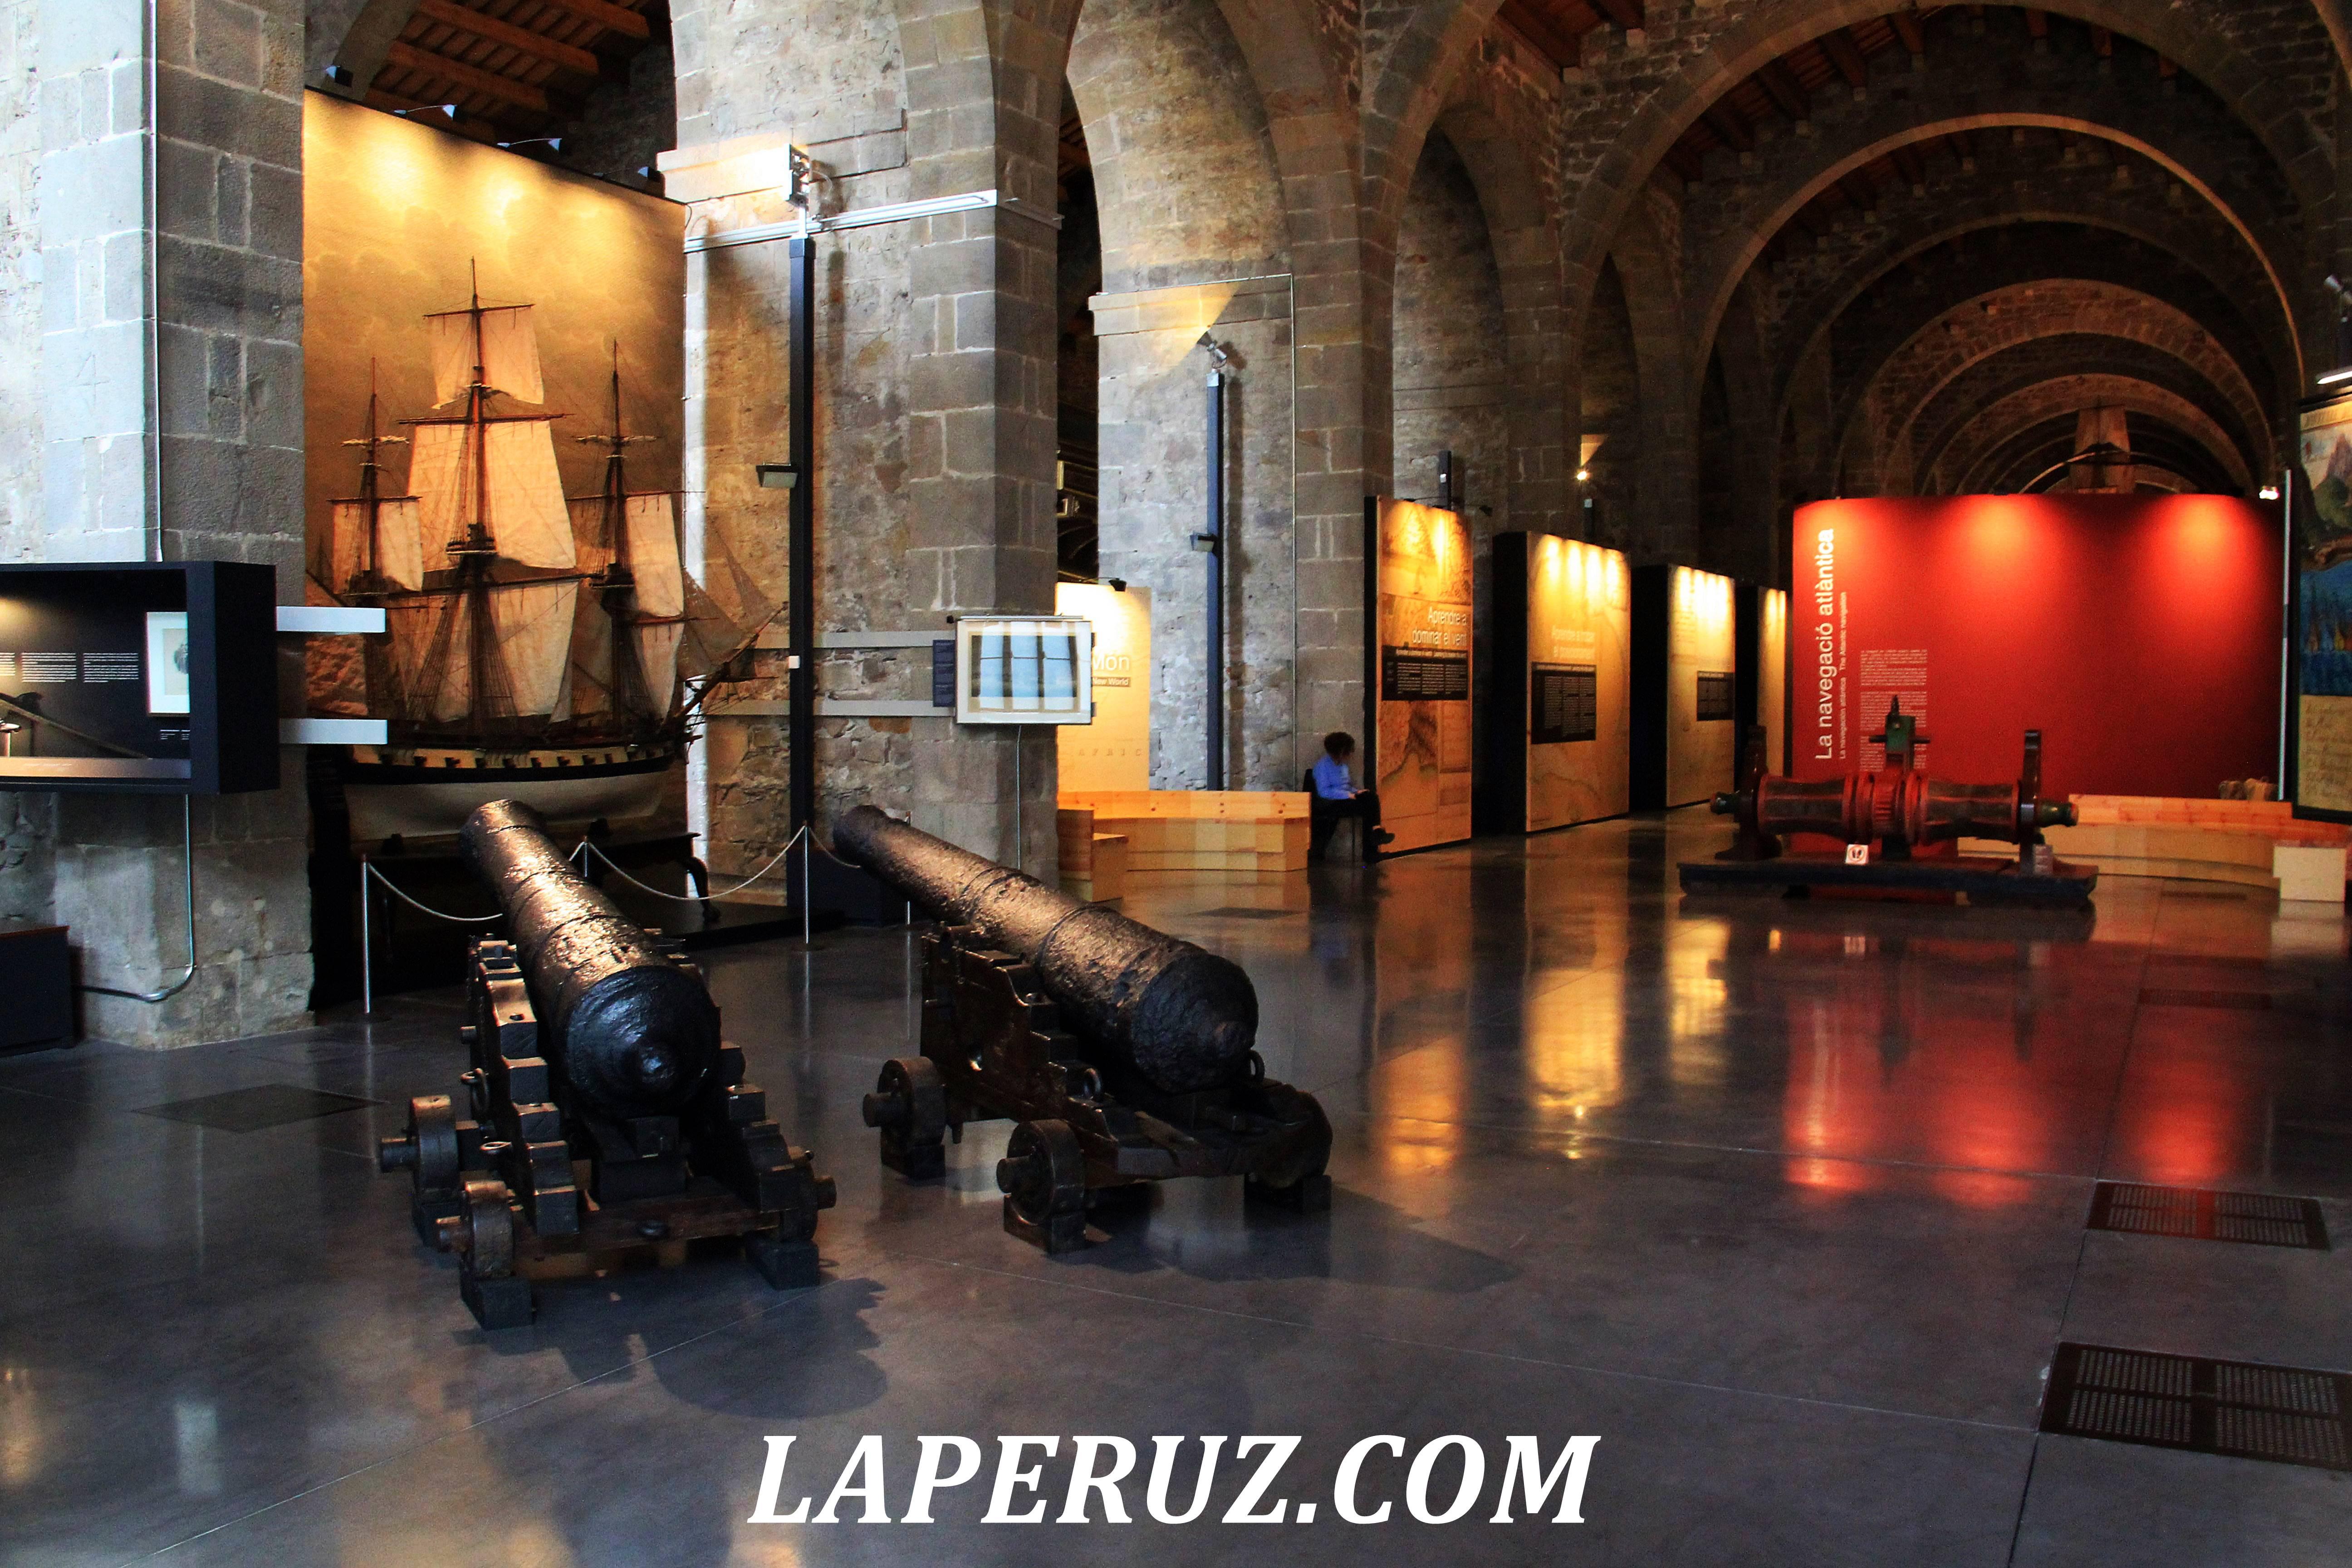 morskoi_muzei_barcelona_2